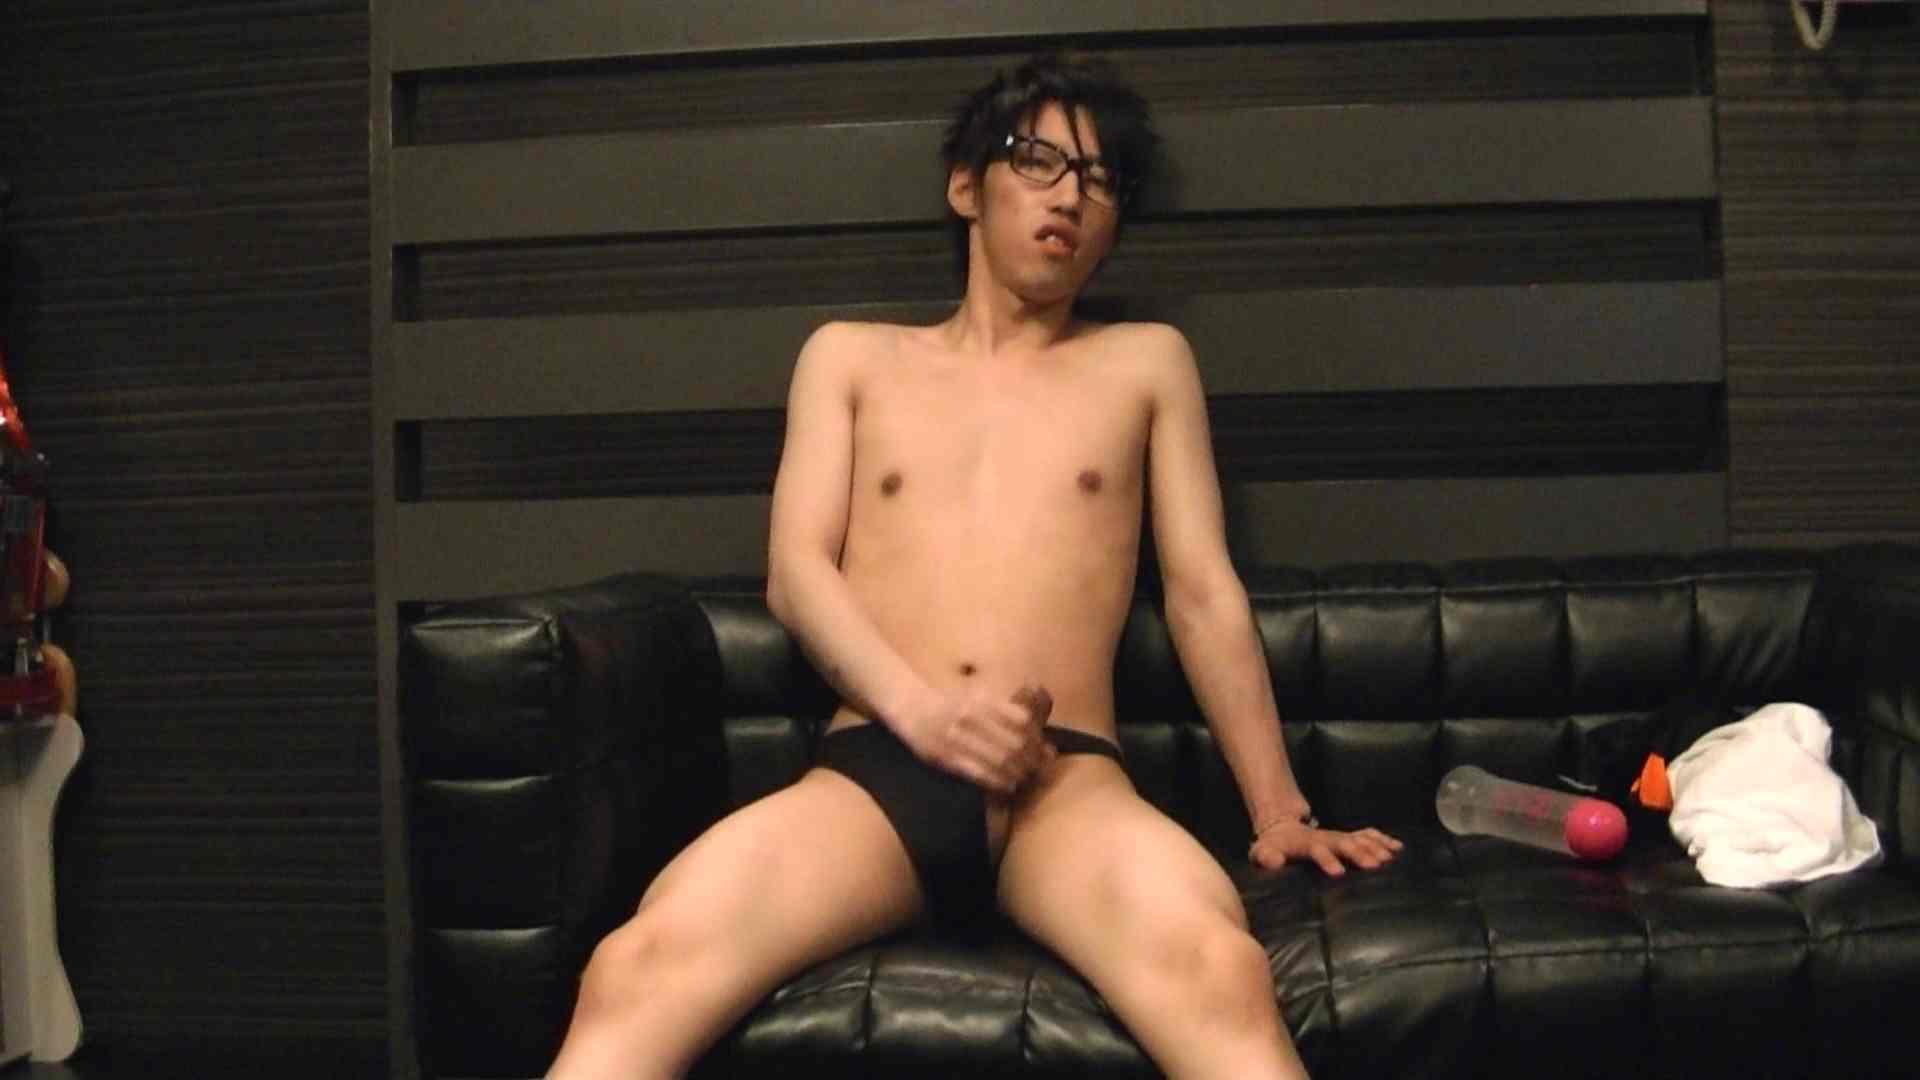 Mr.オナックスさん投稿!HD 貴方のオナニー三万円で撮影させてください。VOL.04 ゲイのオナニー | 完全無修正で!  12画像 7